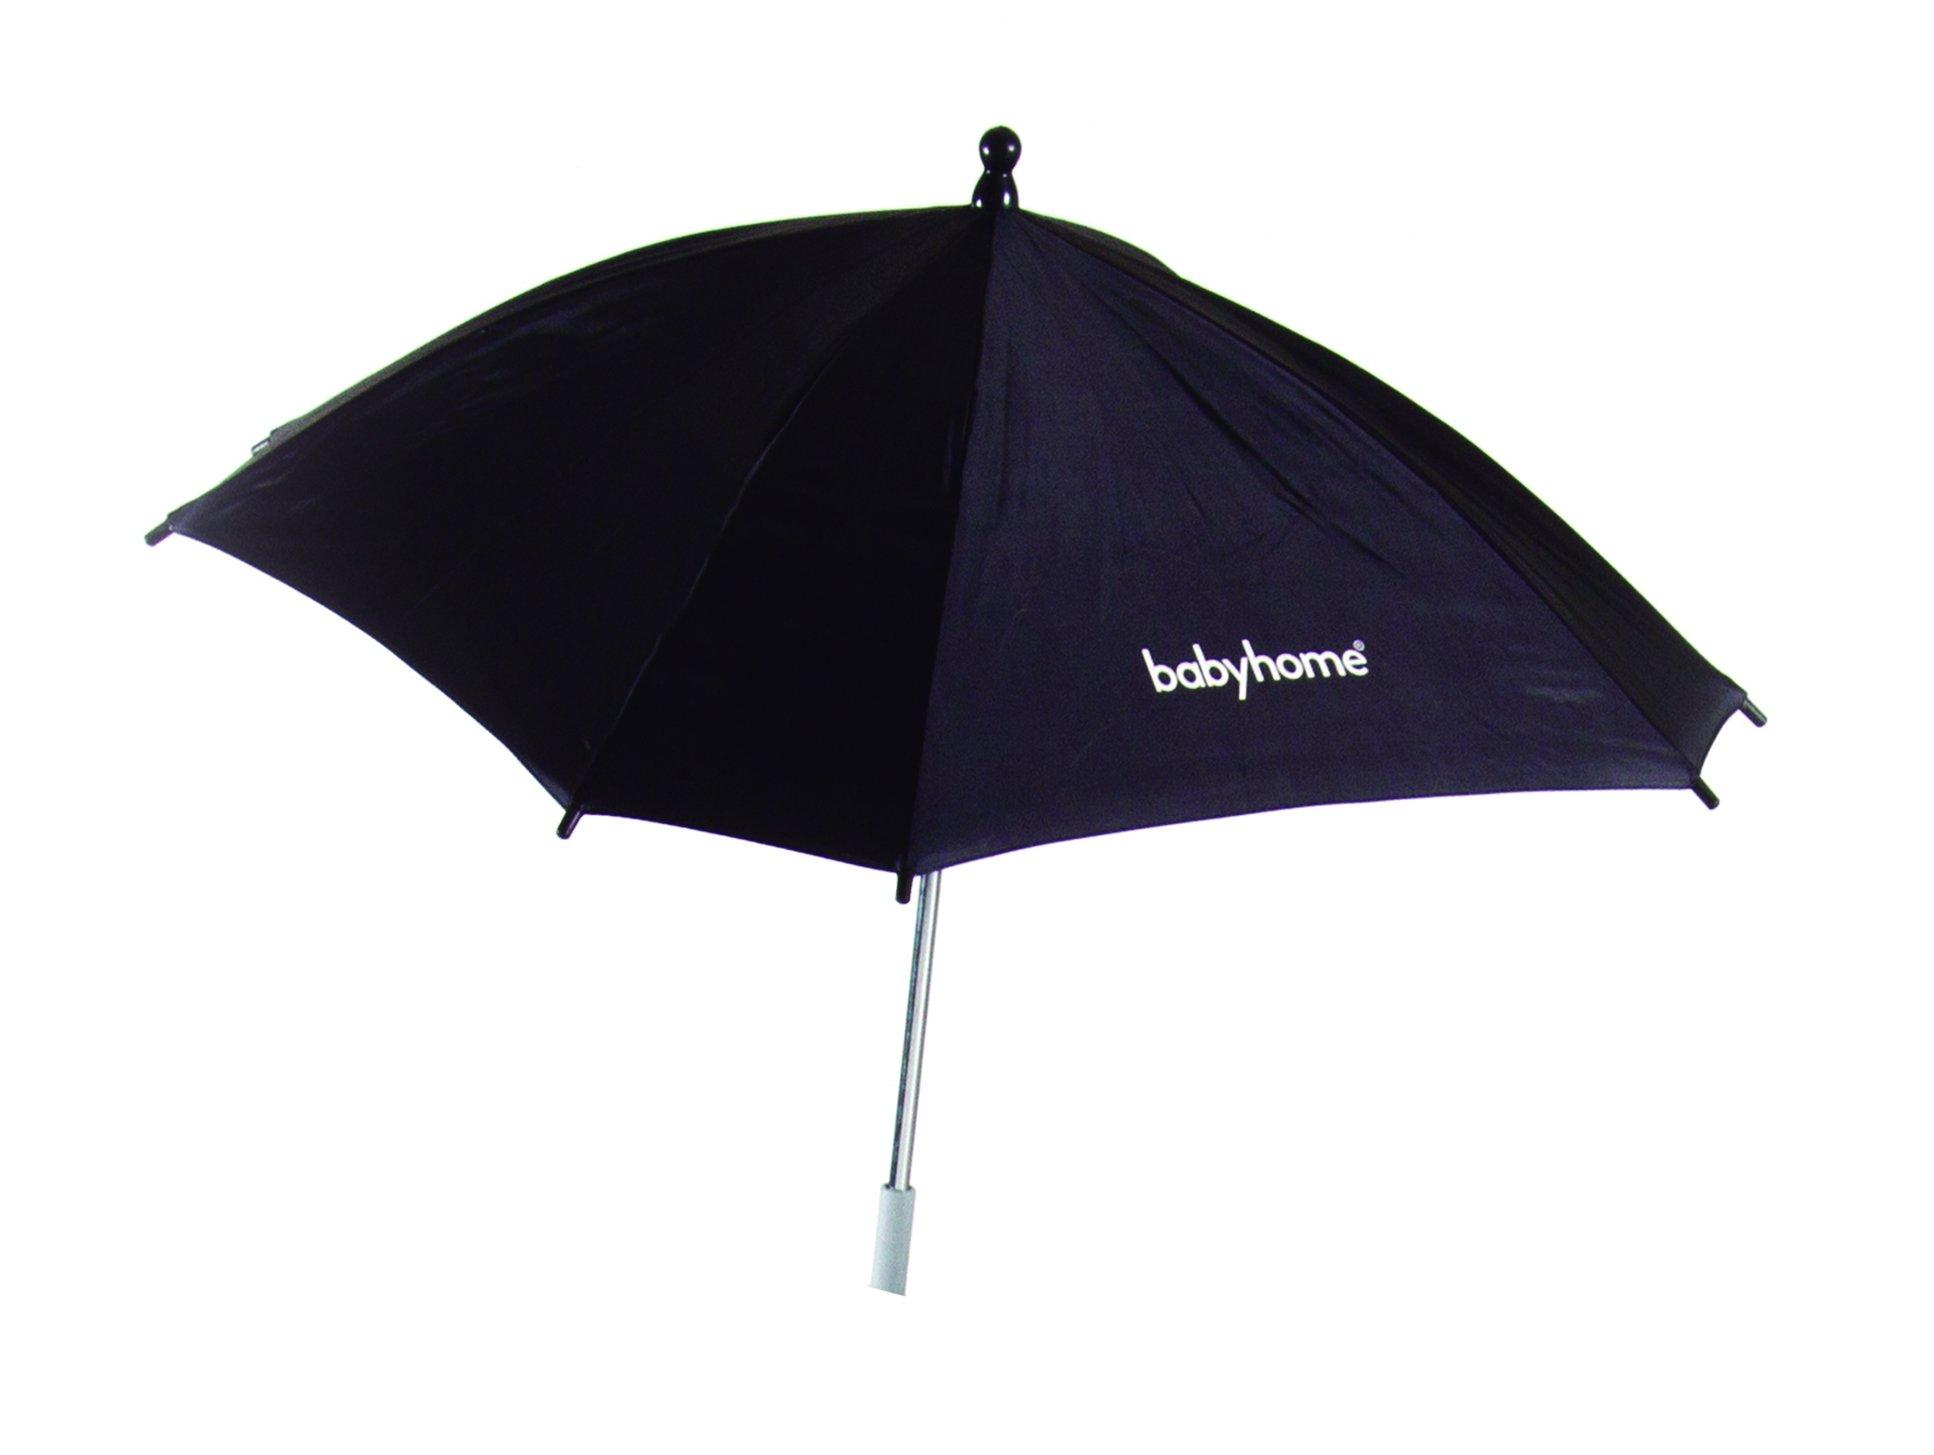 BabyHome Emotion Sun Umbrella - Black